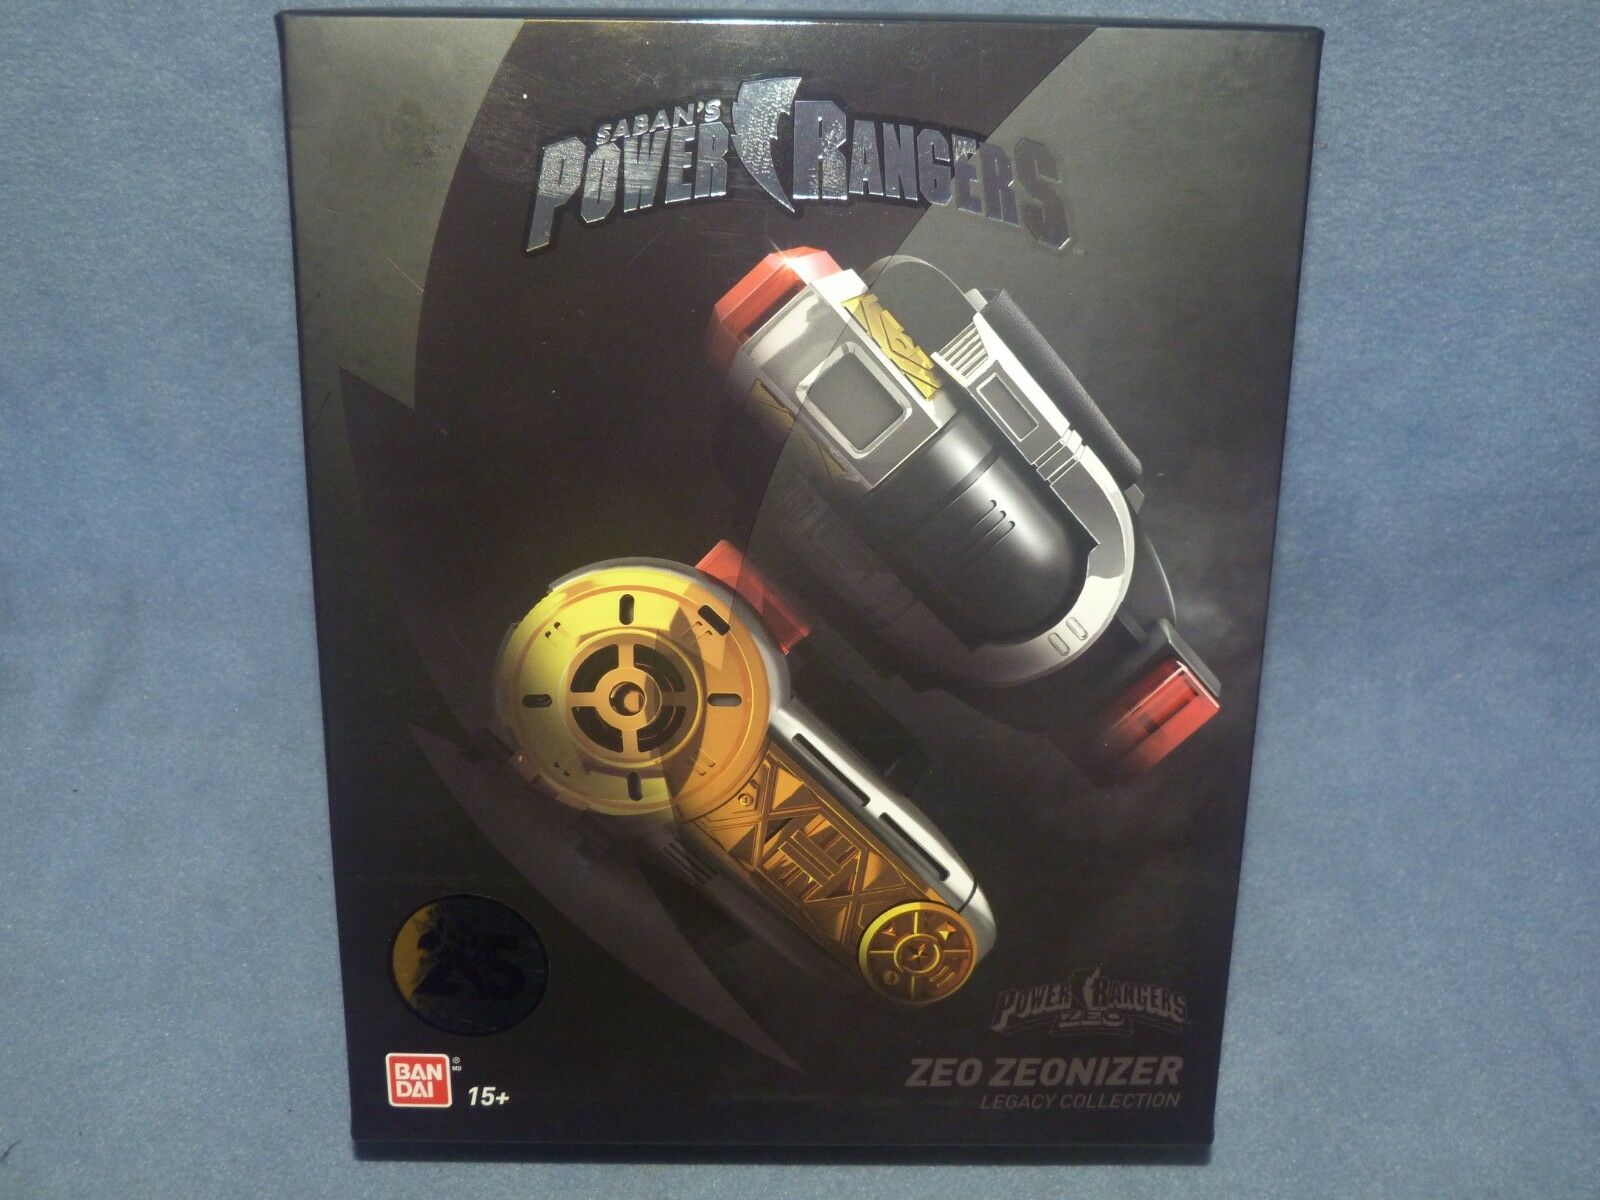 POWER Rangers Zeo Legacy zeonizer Morpher Set-Nuovo di Zecca